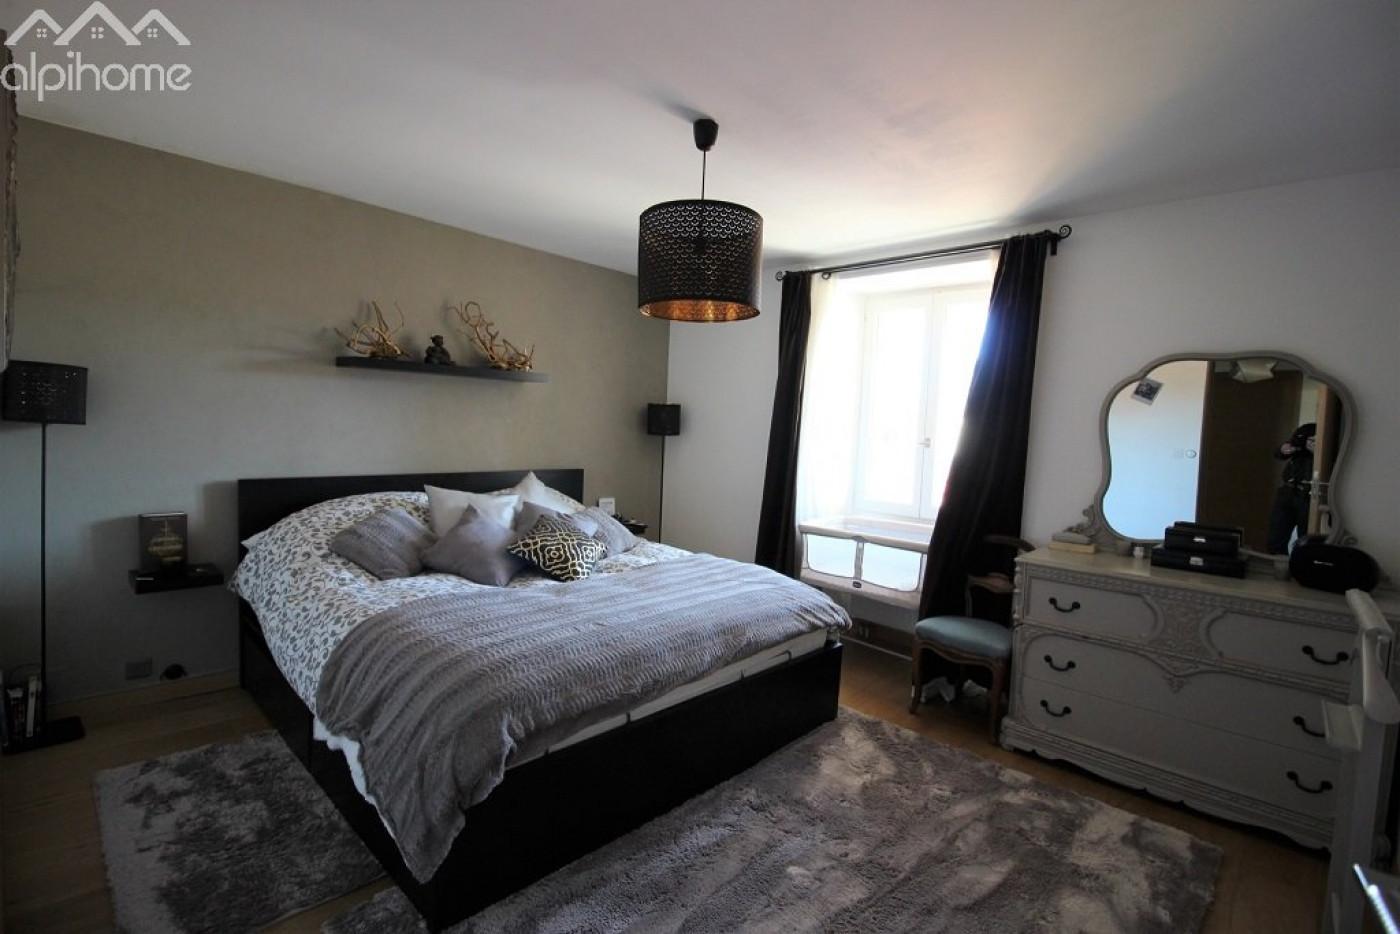 A vendre  Allonzier La Caille | Réf 74021521 - Alpihome